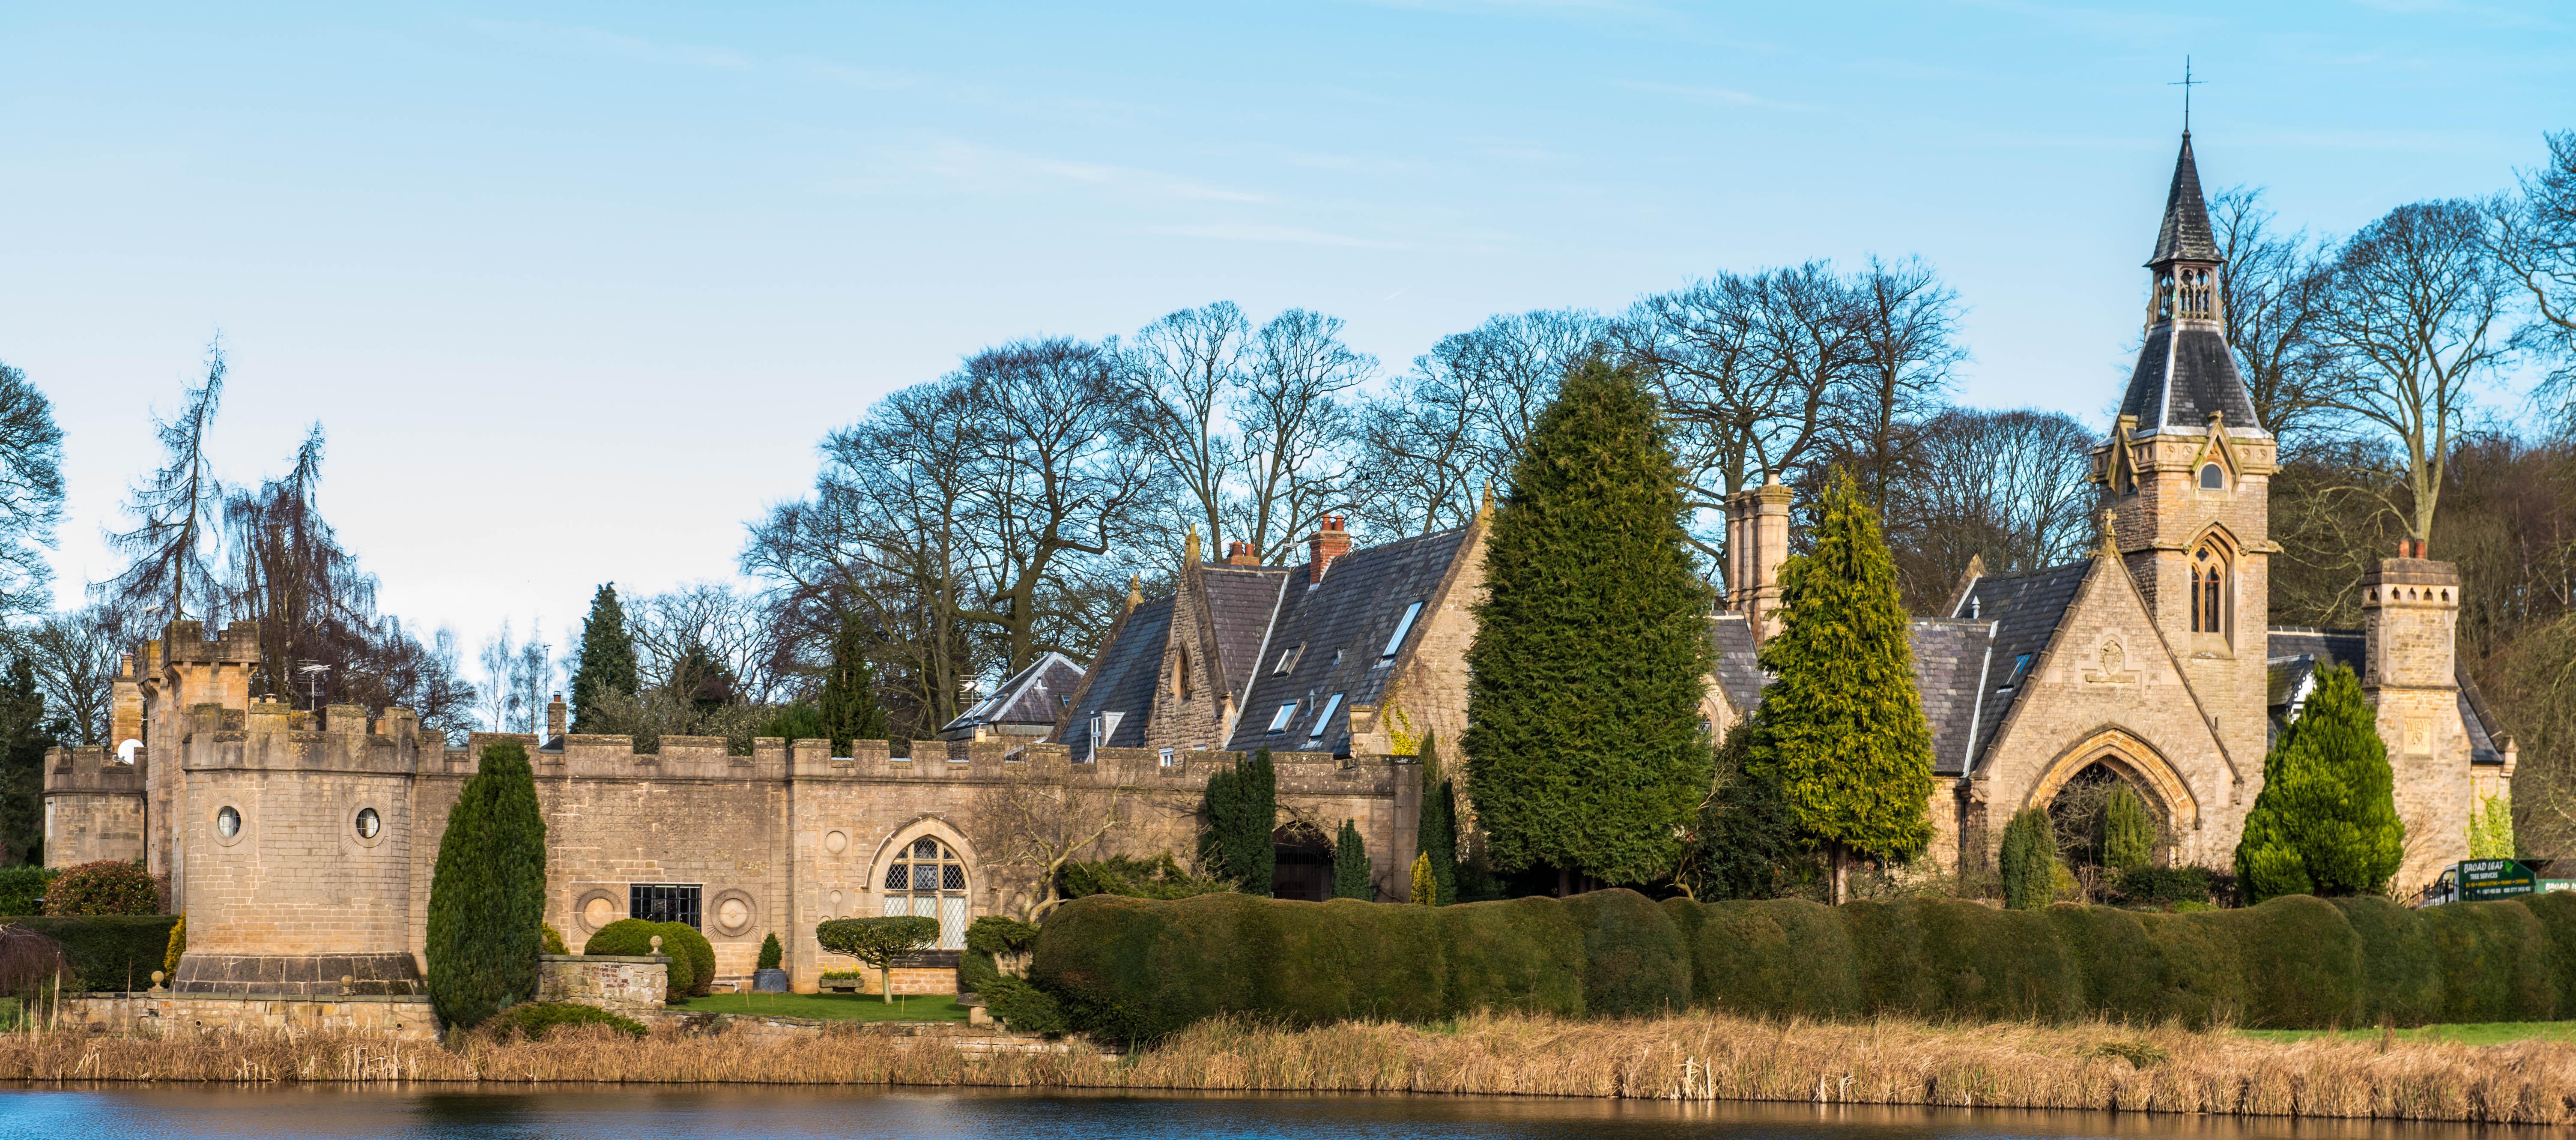 newstead abbey1 (10 of 253)